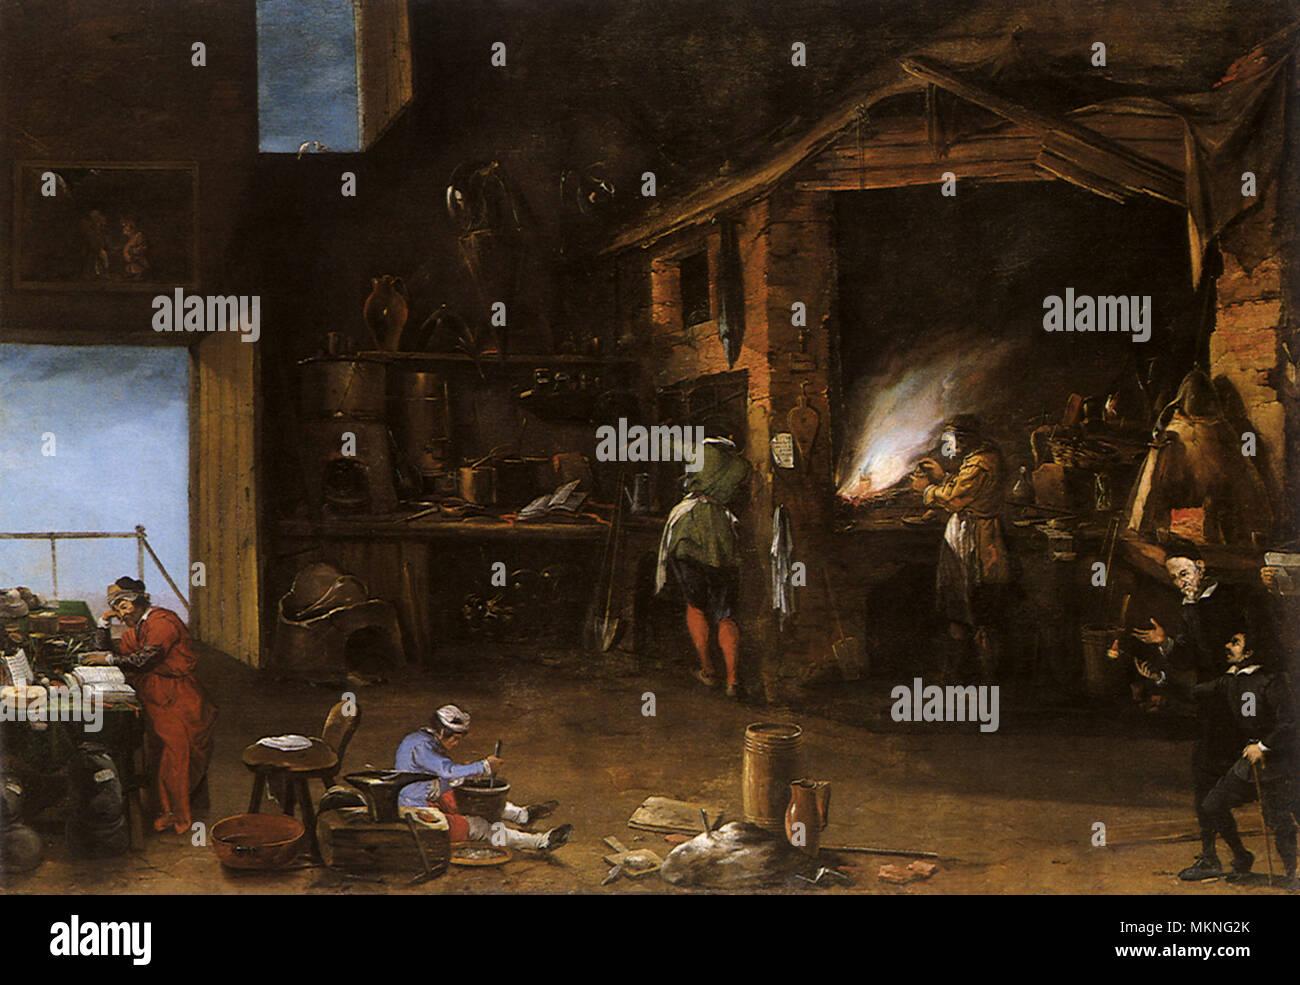 The Alchemist - Stock Image